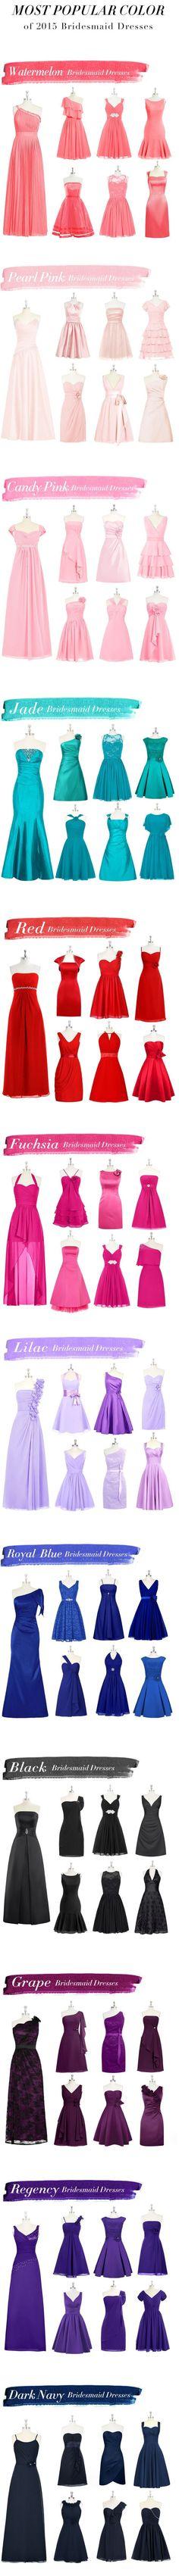 Most Popular Bridesmaids Dress Colors 2015 wedding weddings bridesmaids #wedding-pinned by wedding specialists http://dazzlemeelegant.com